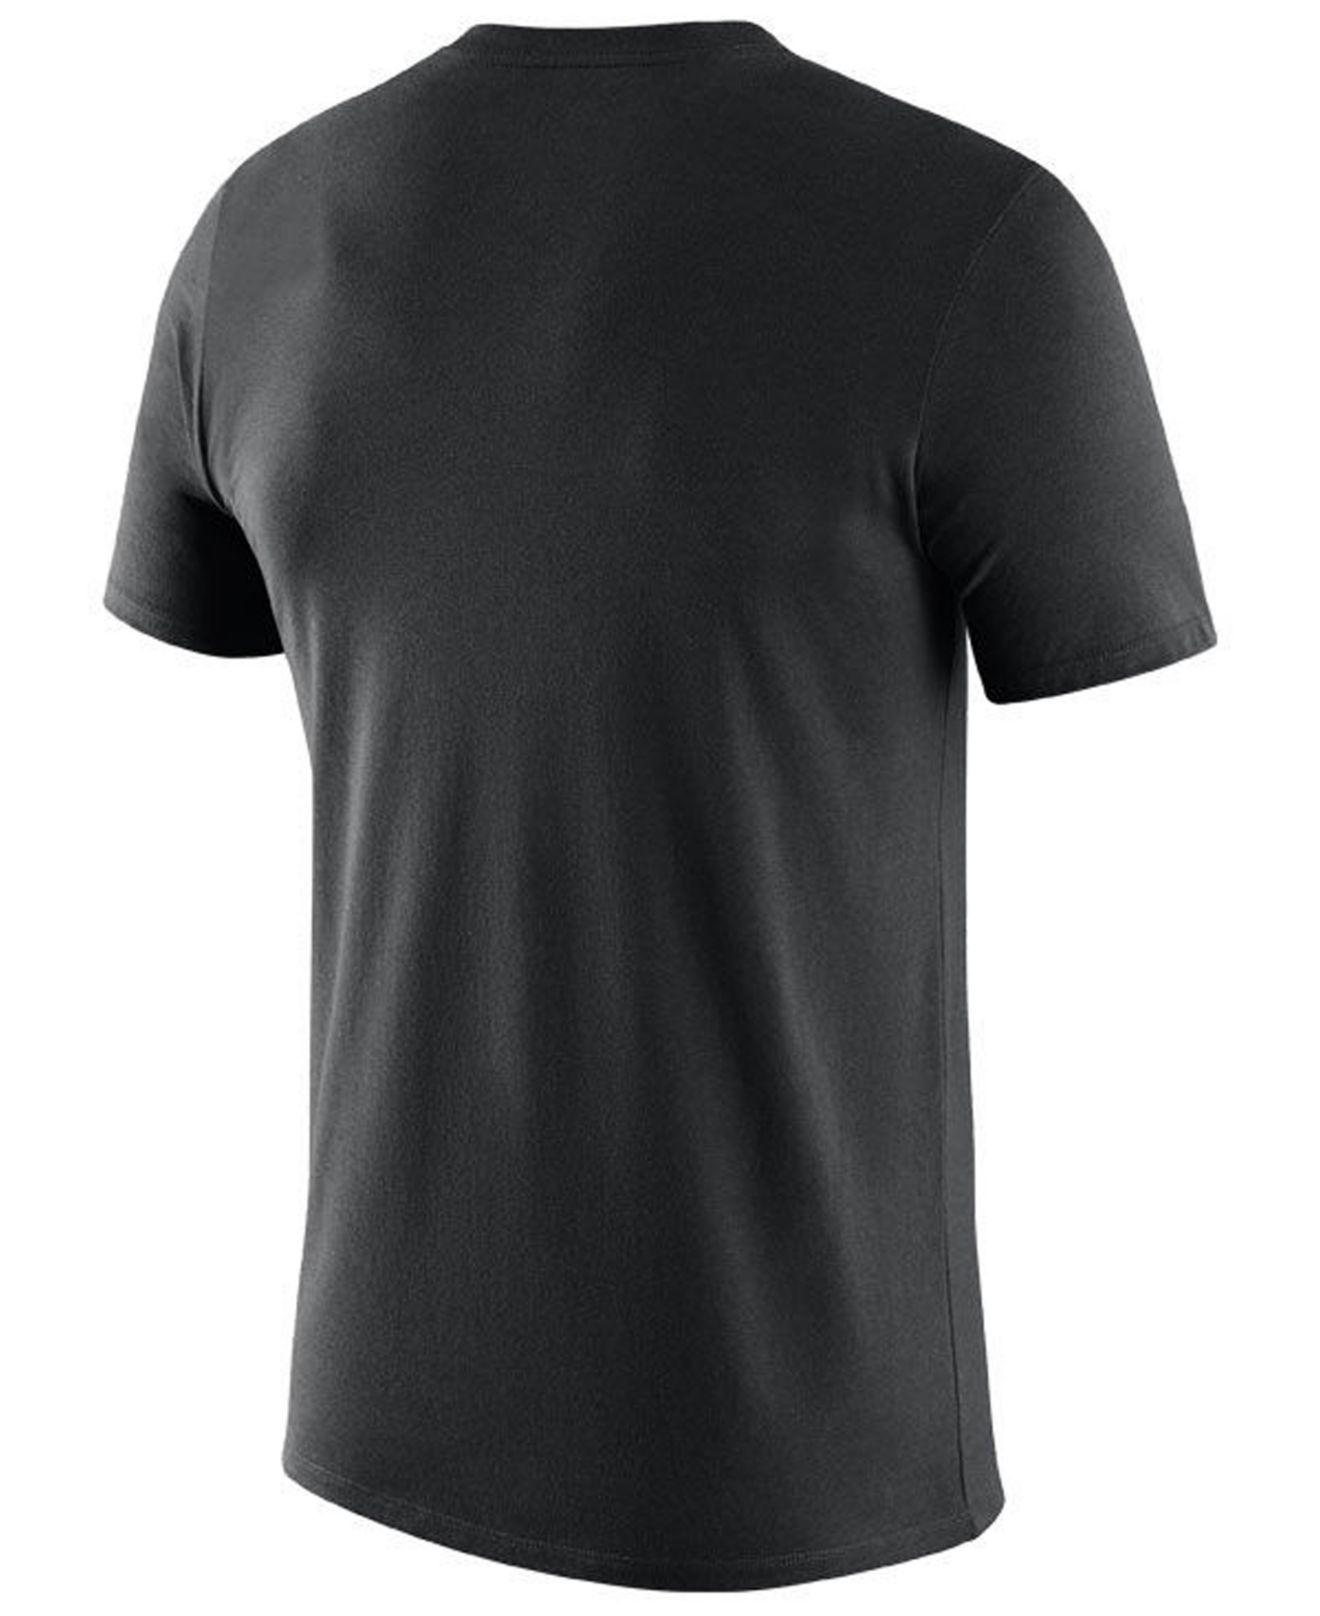 Lyst - Nike Philadelphia Eagles Dri-fit Cotton Essential Logo T-shirt in  Black for Men b5aeb6acf